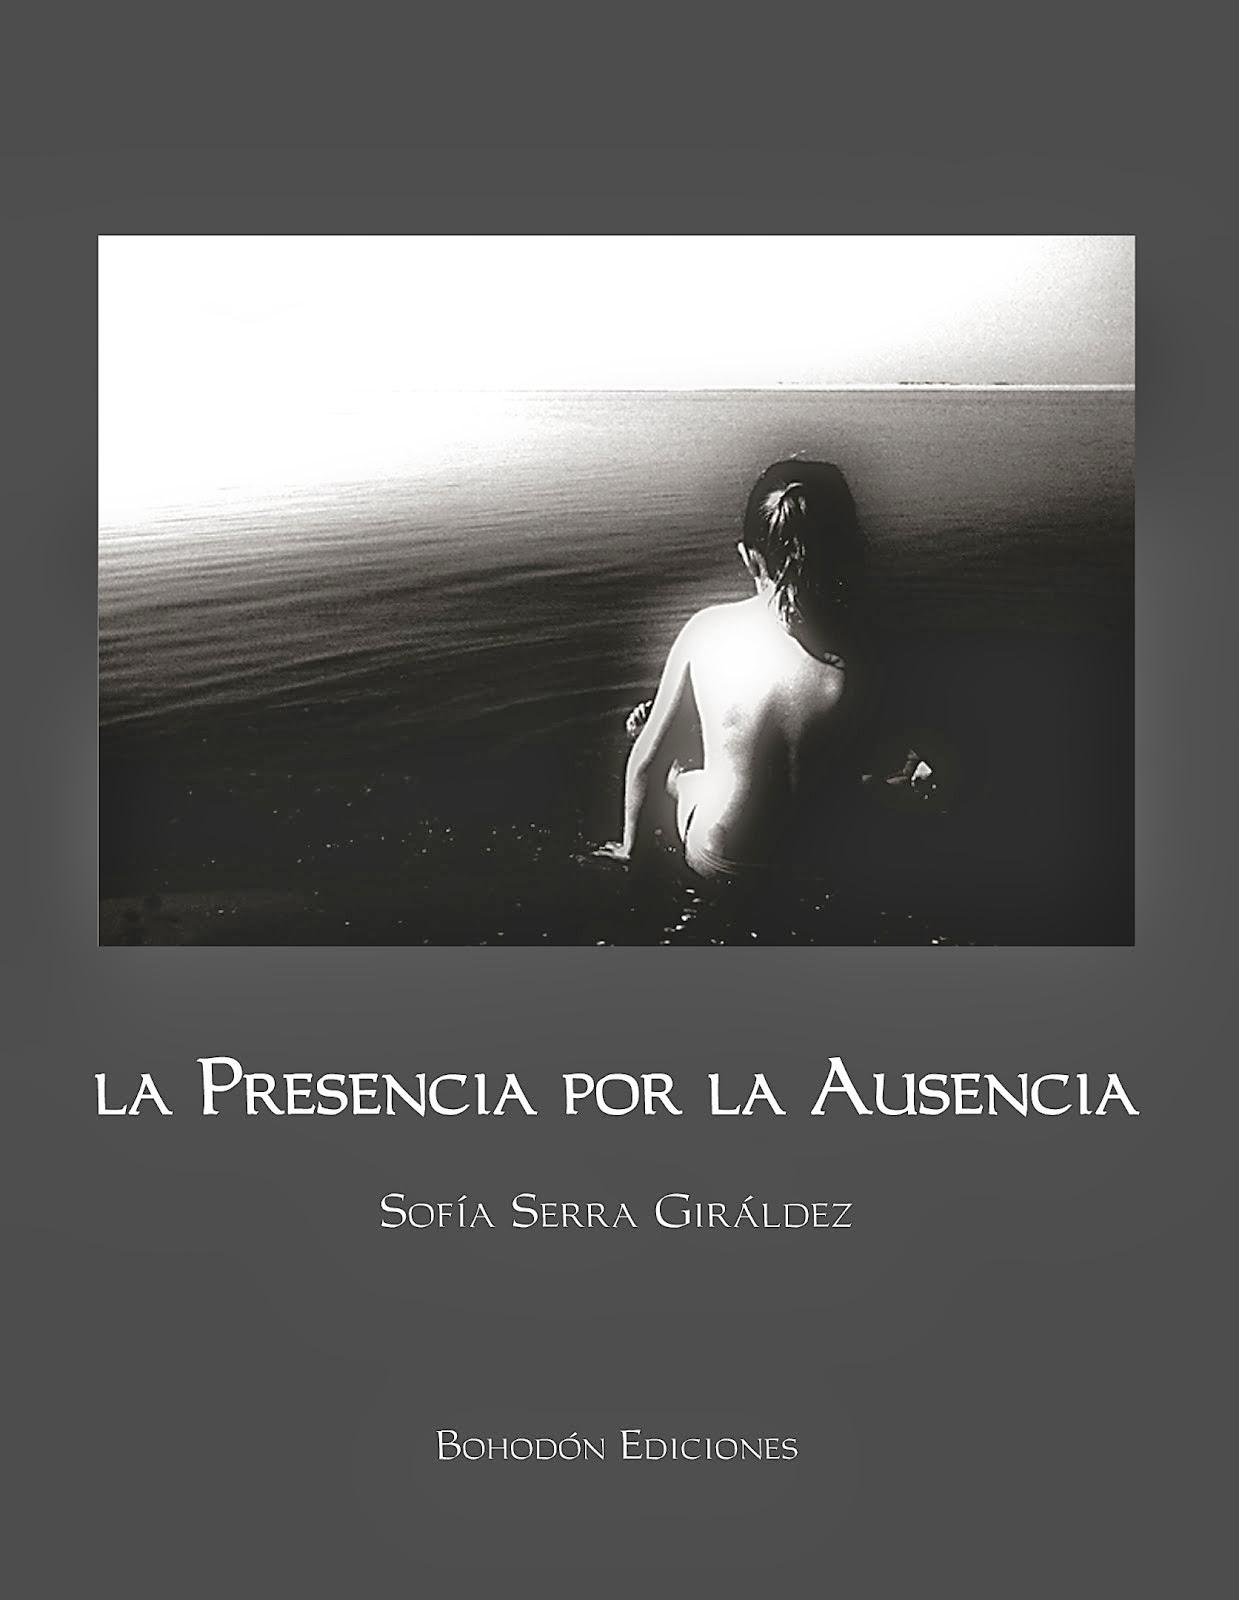 La presencia por la ausencia